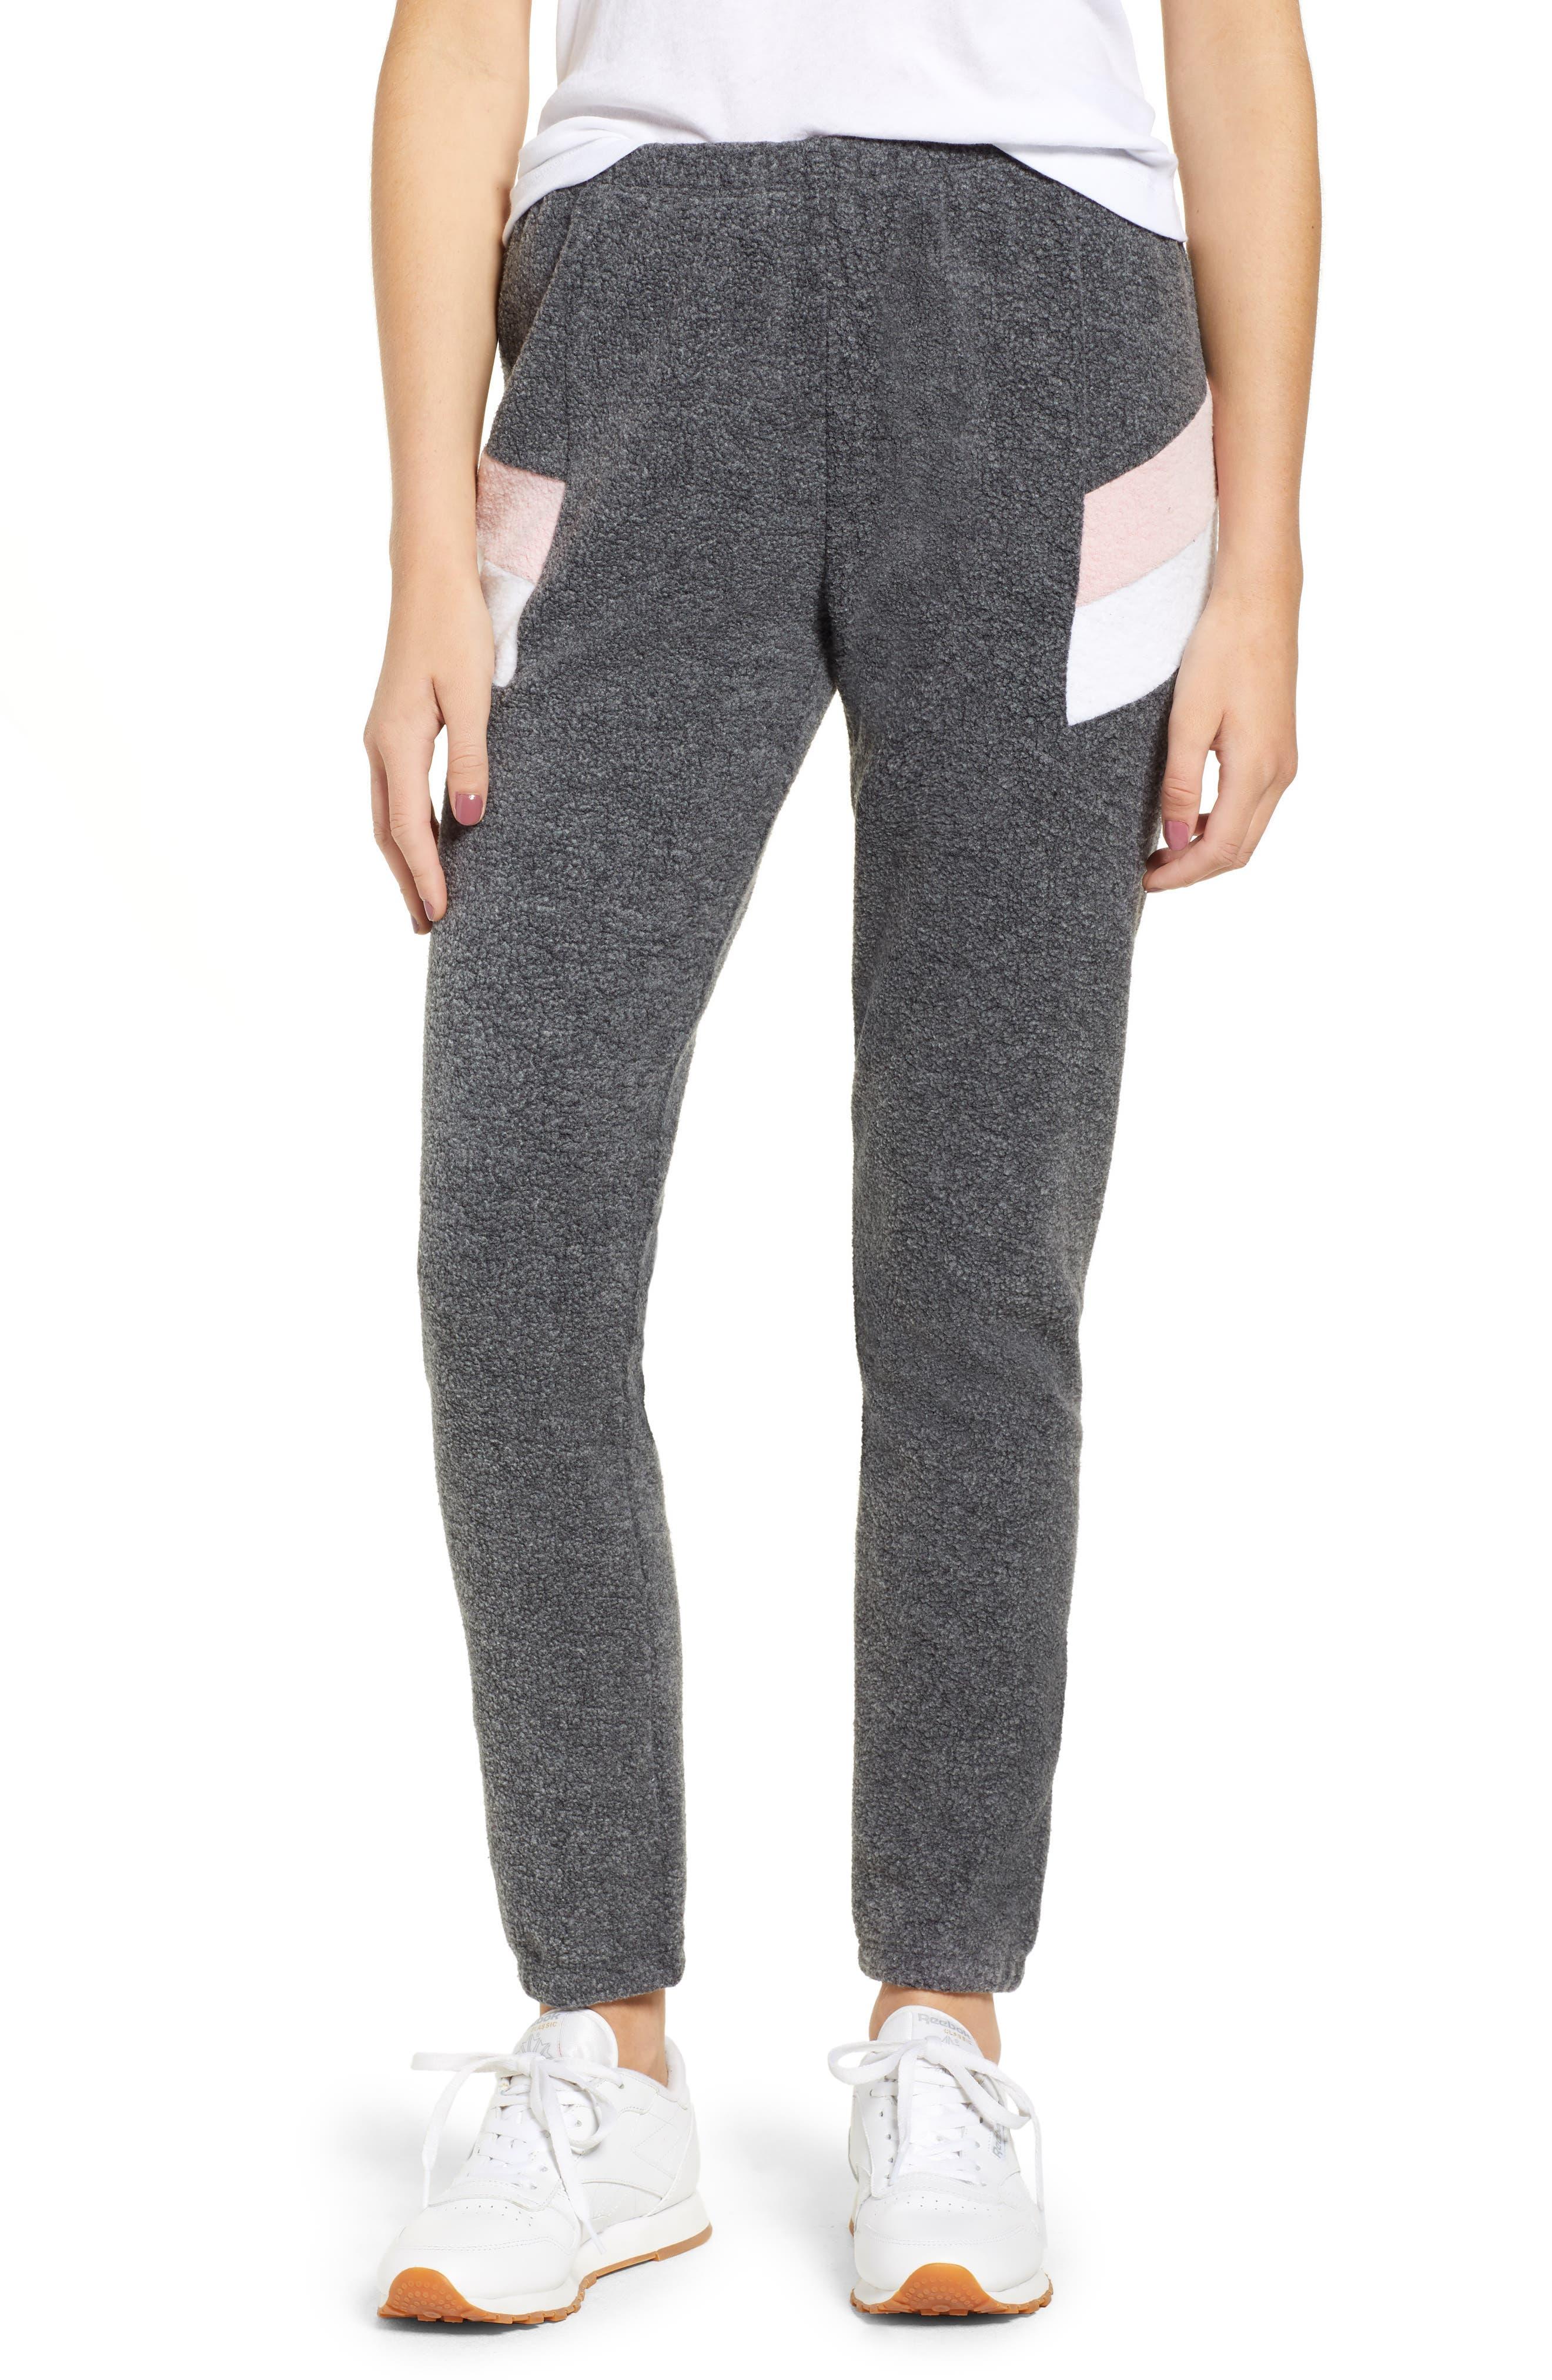 Knox Sweatpants,                             Main thumbnail 1, color,                             CLEAN BLACK